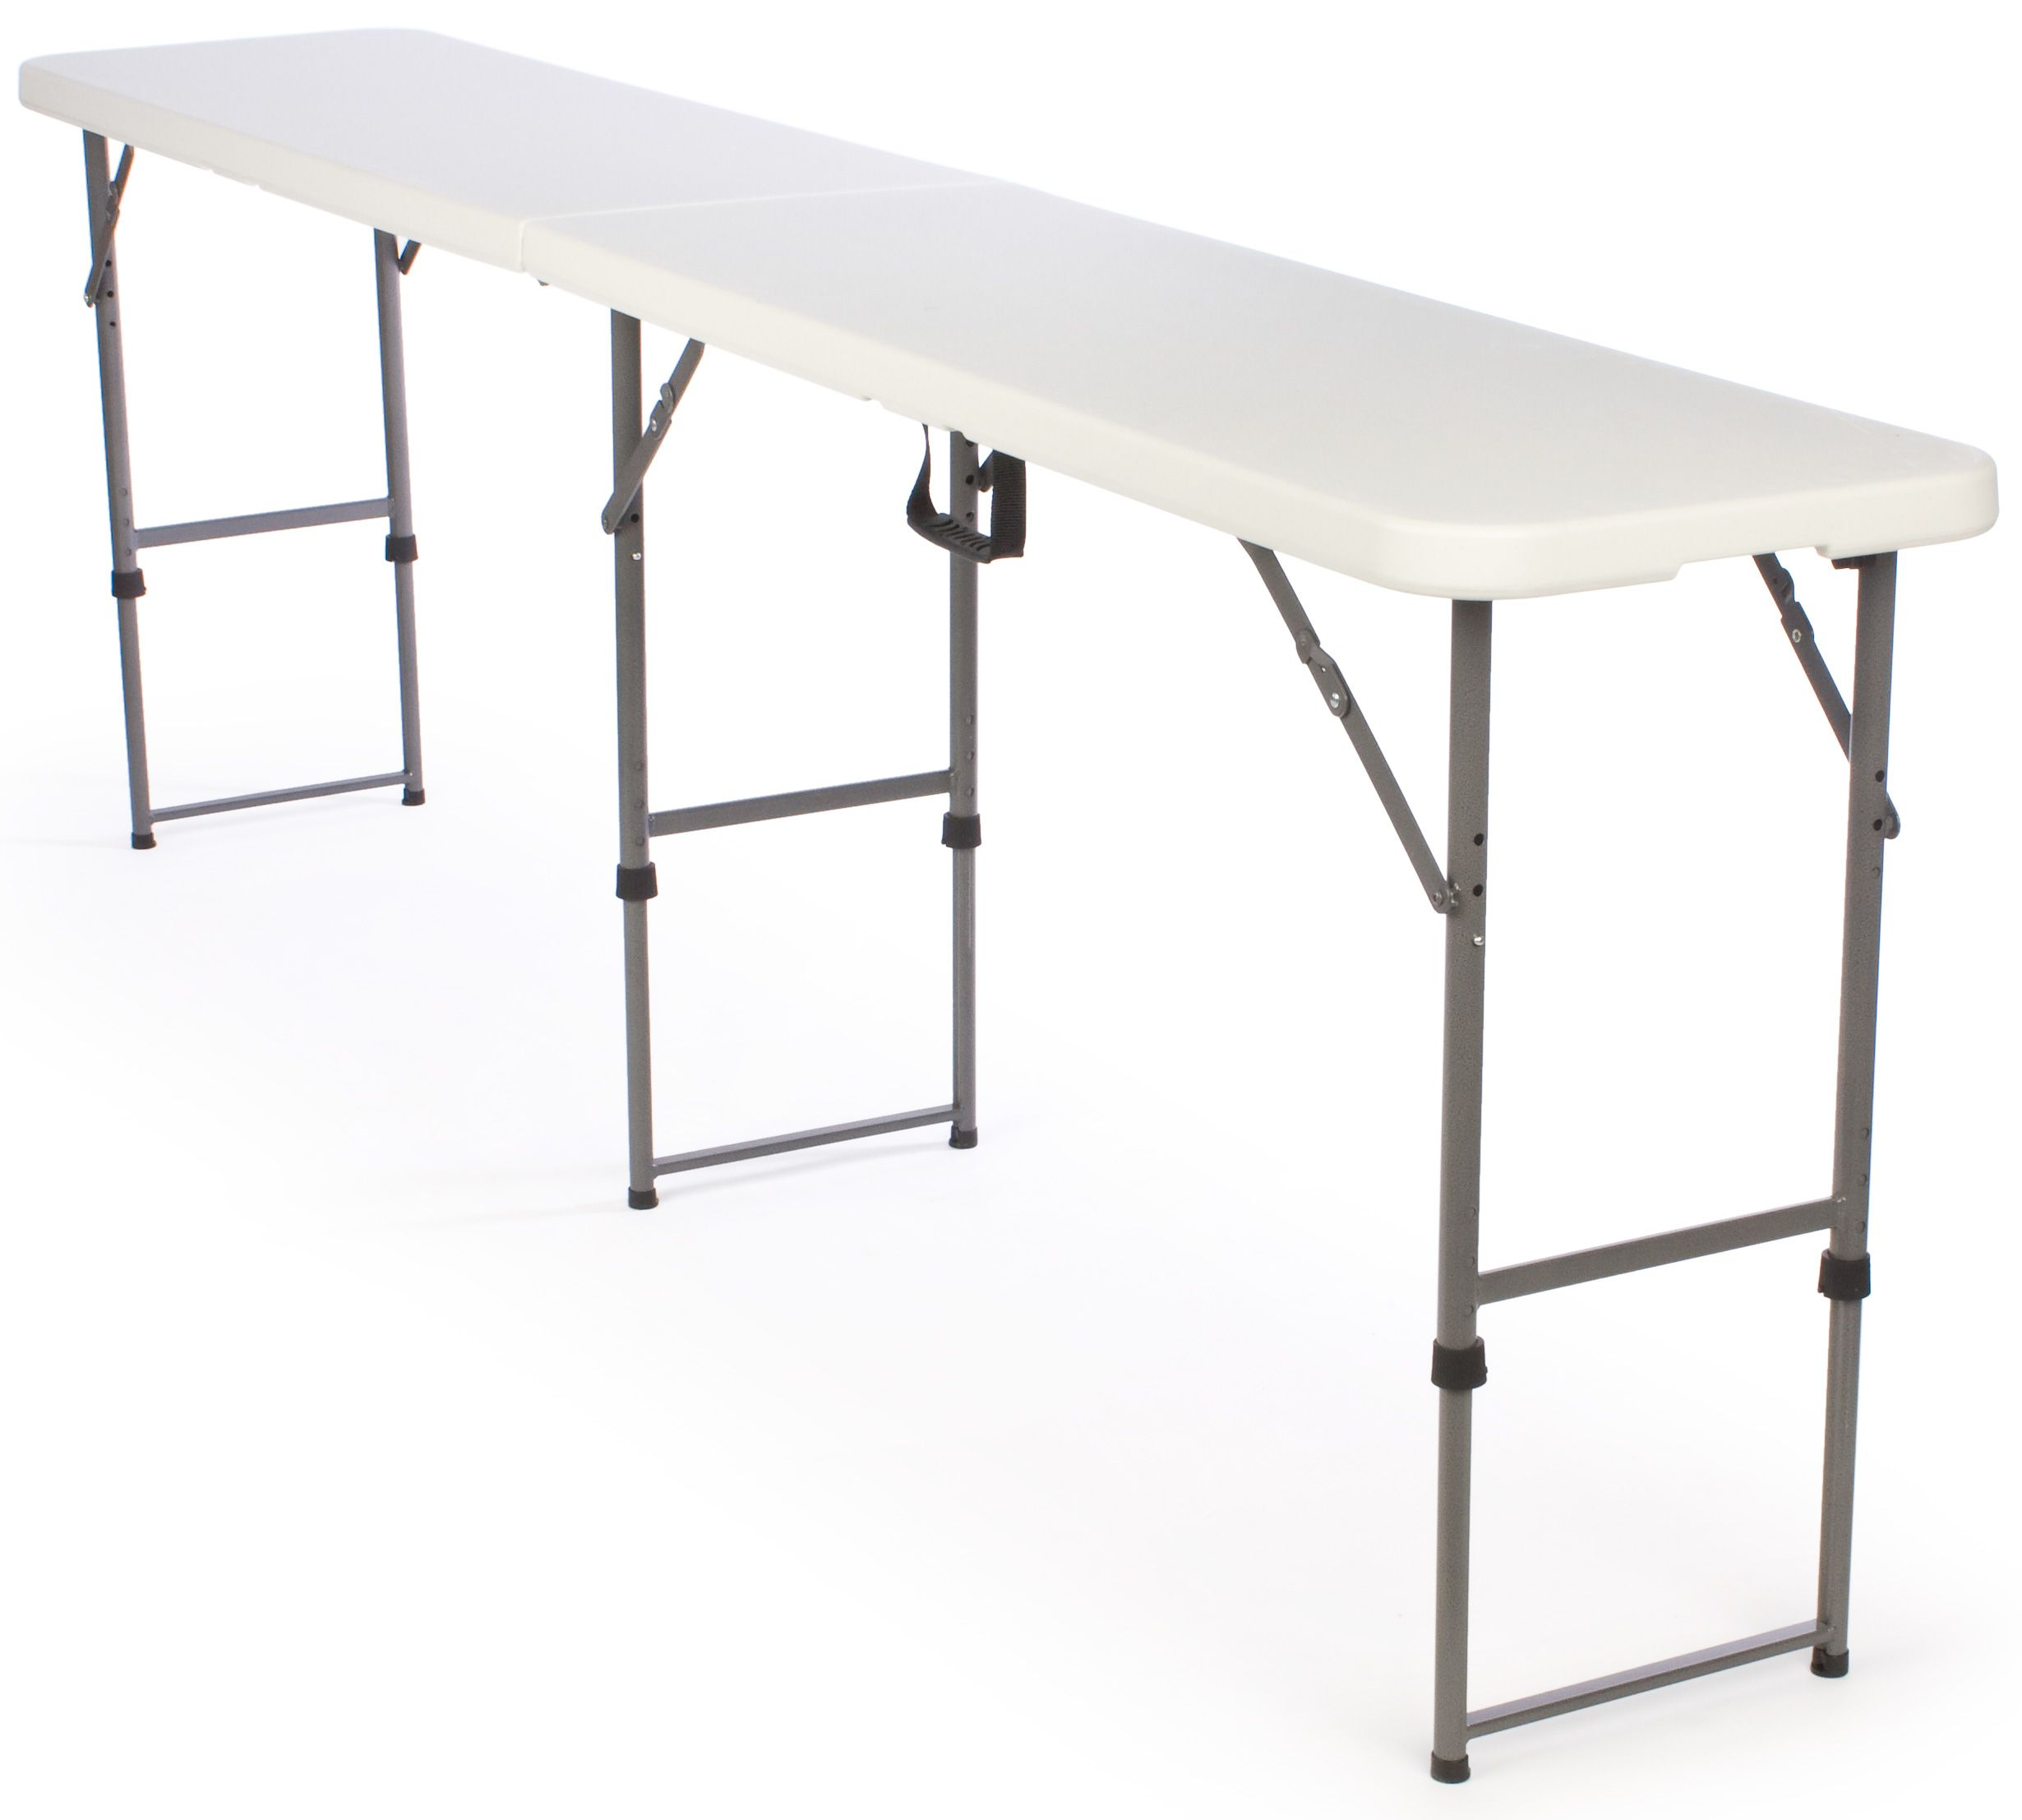 8 5 Folding Table Height Adjustable White Folding Table Adjustable Height Table Adjustable Table